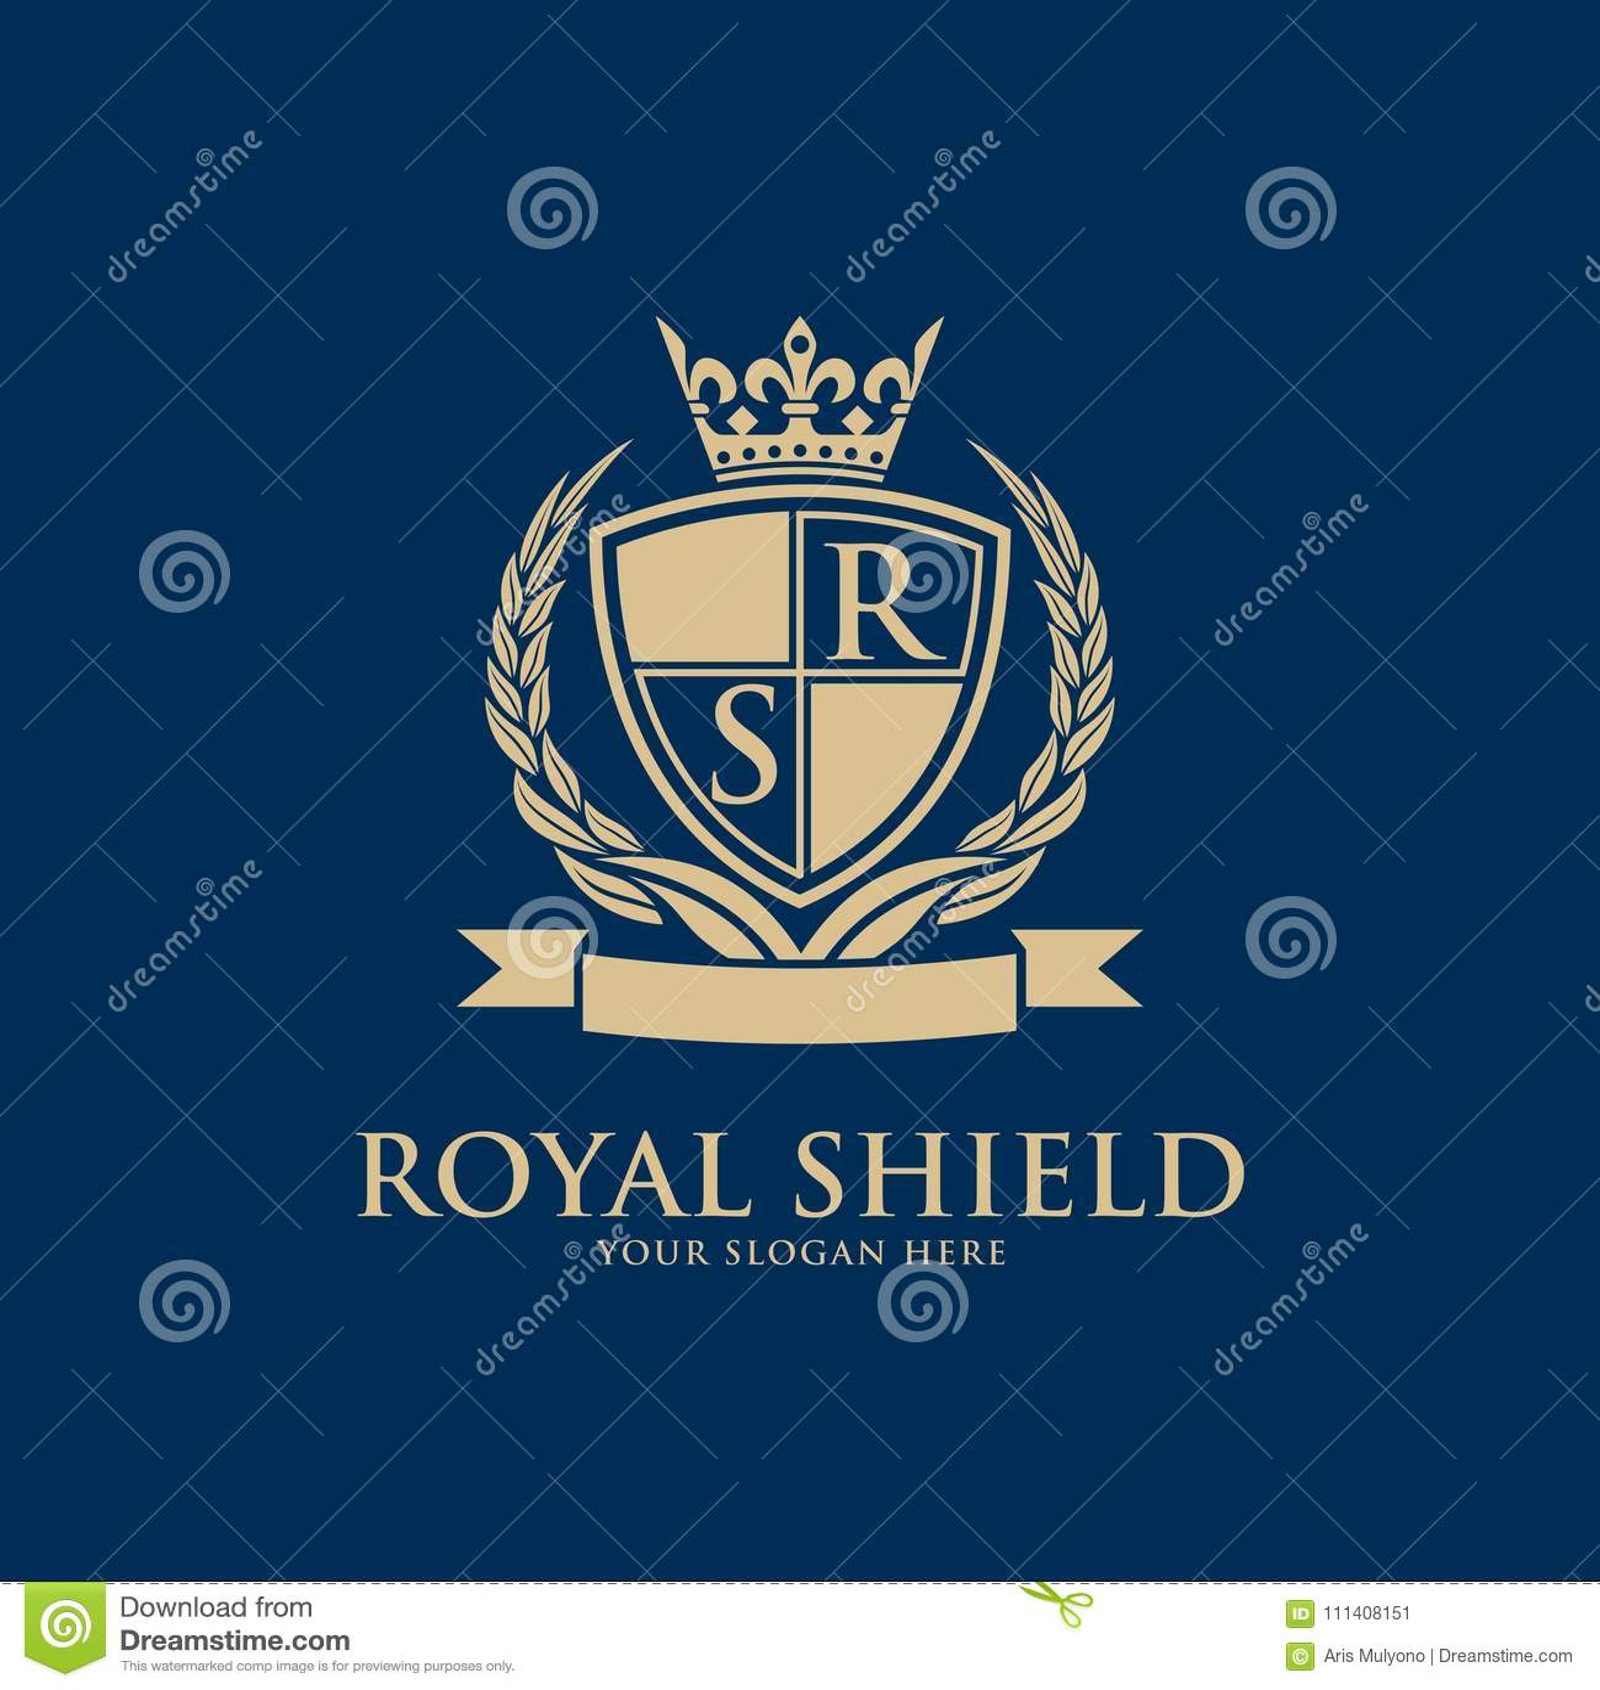 crests logo hotel logo luxury letter monogram stock illustration